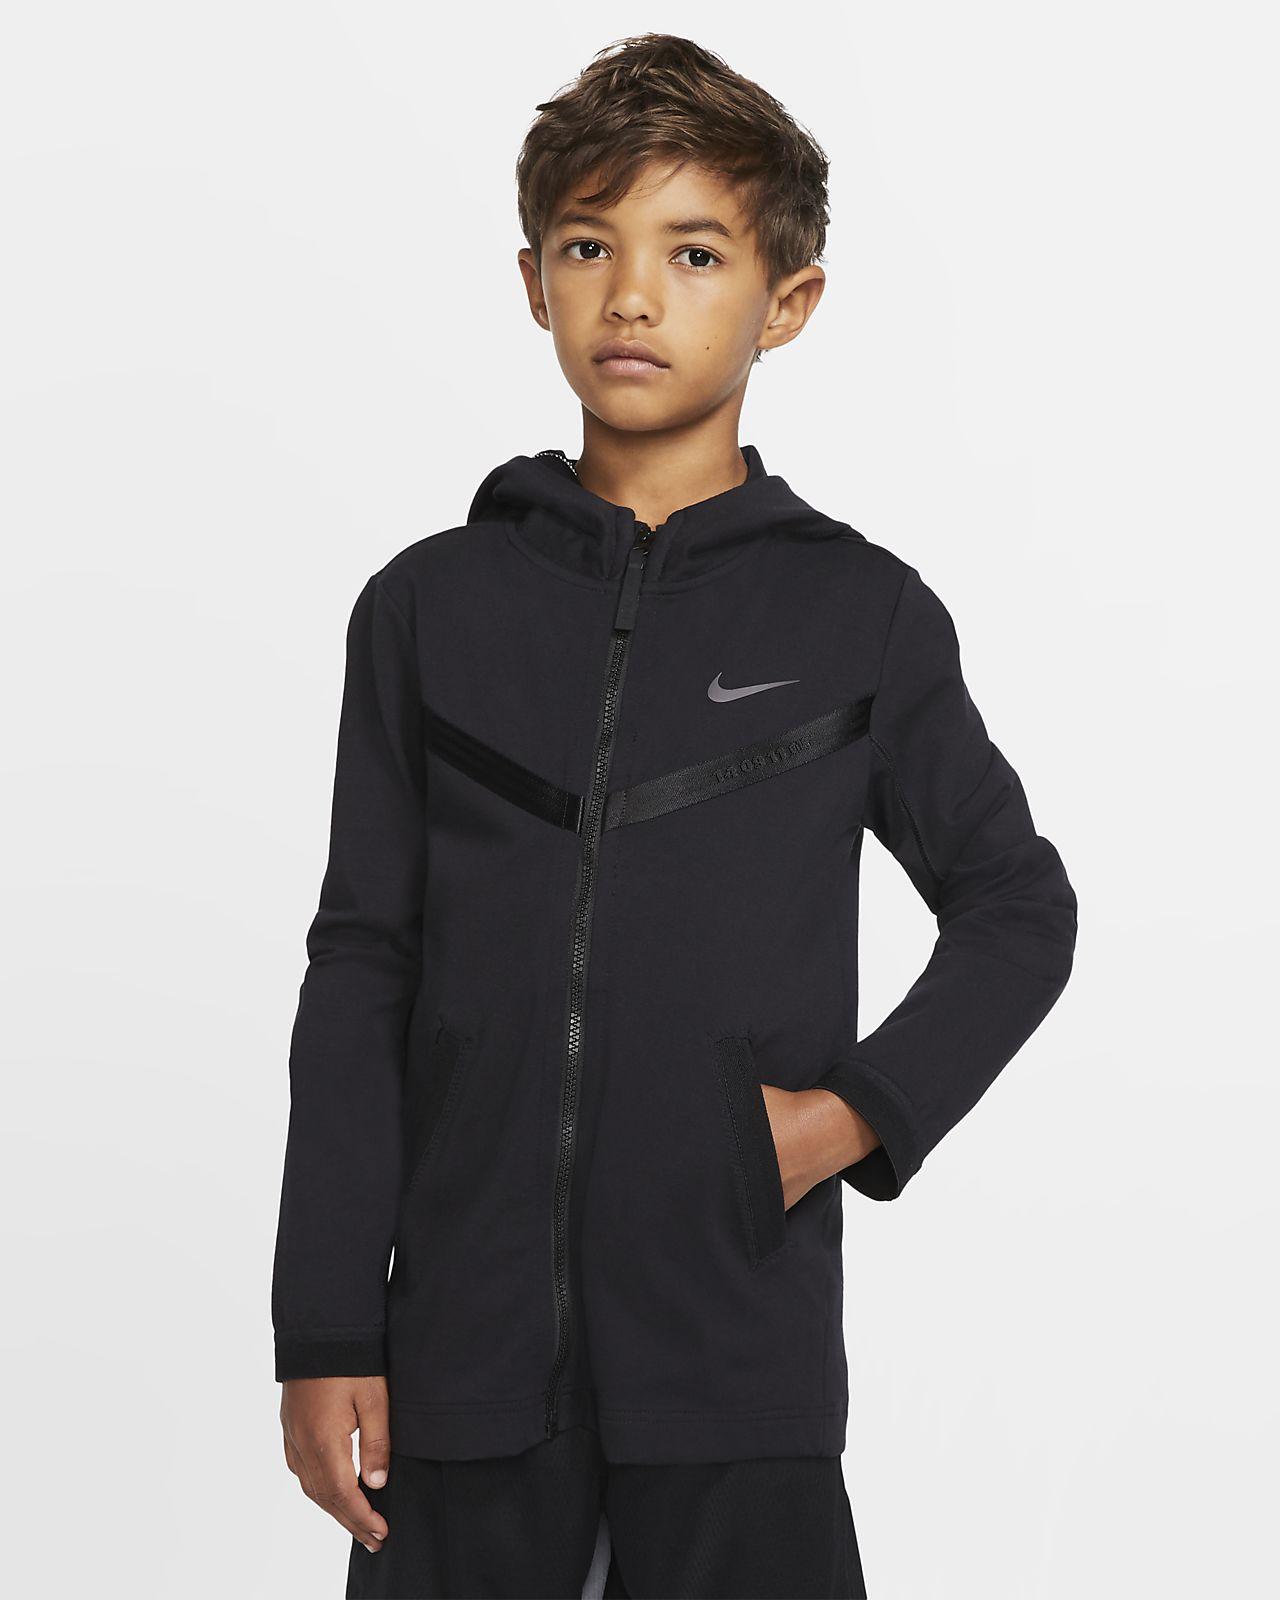 Nike Sportswear Tech Pack Older Kids' Full-Zip Hoodie